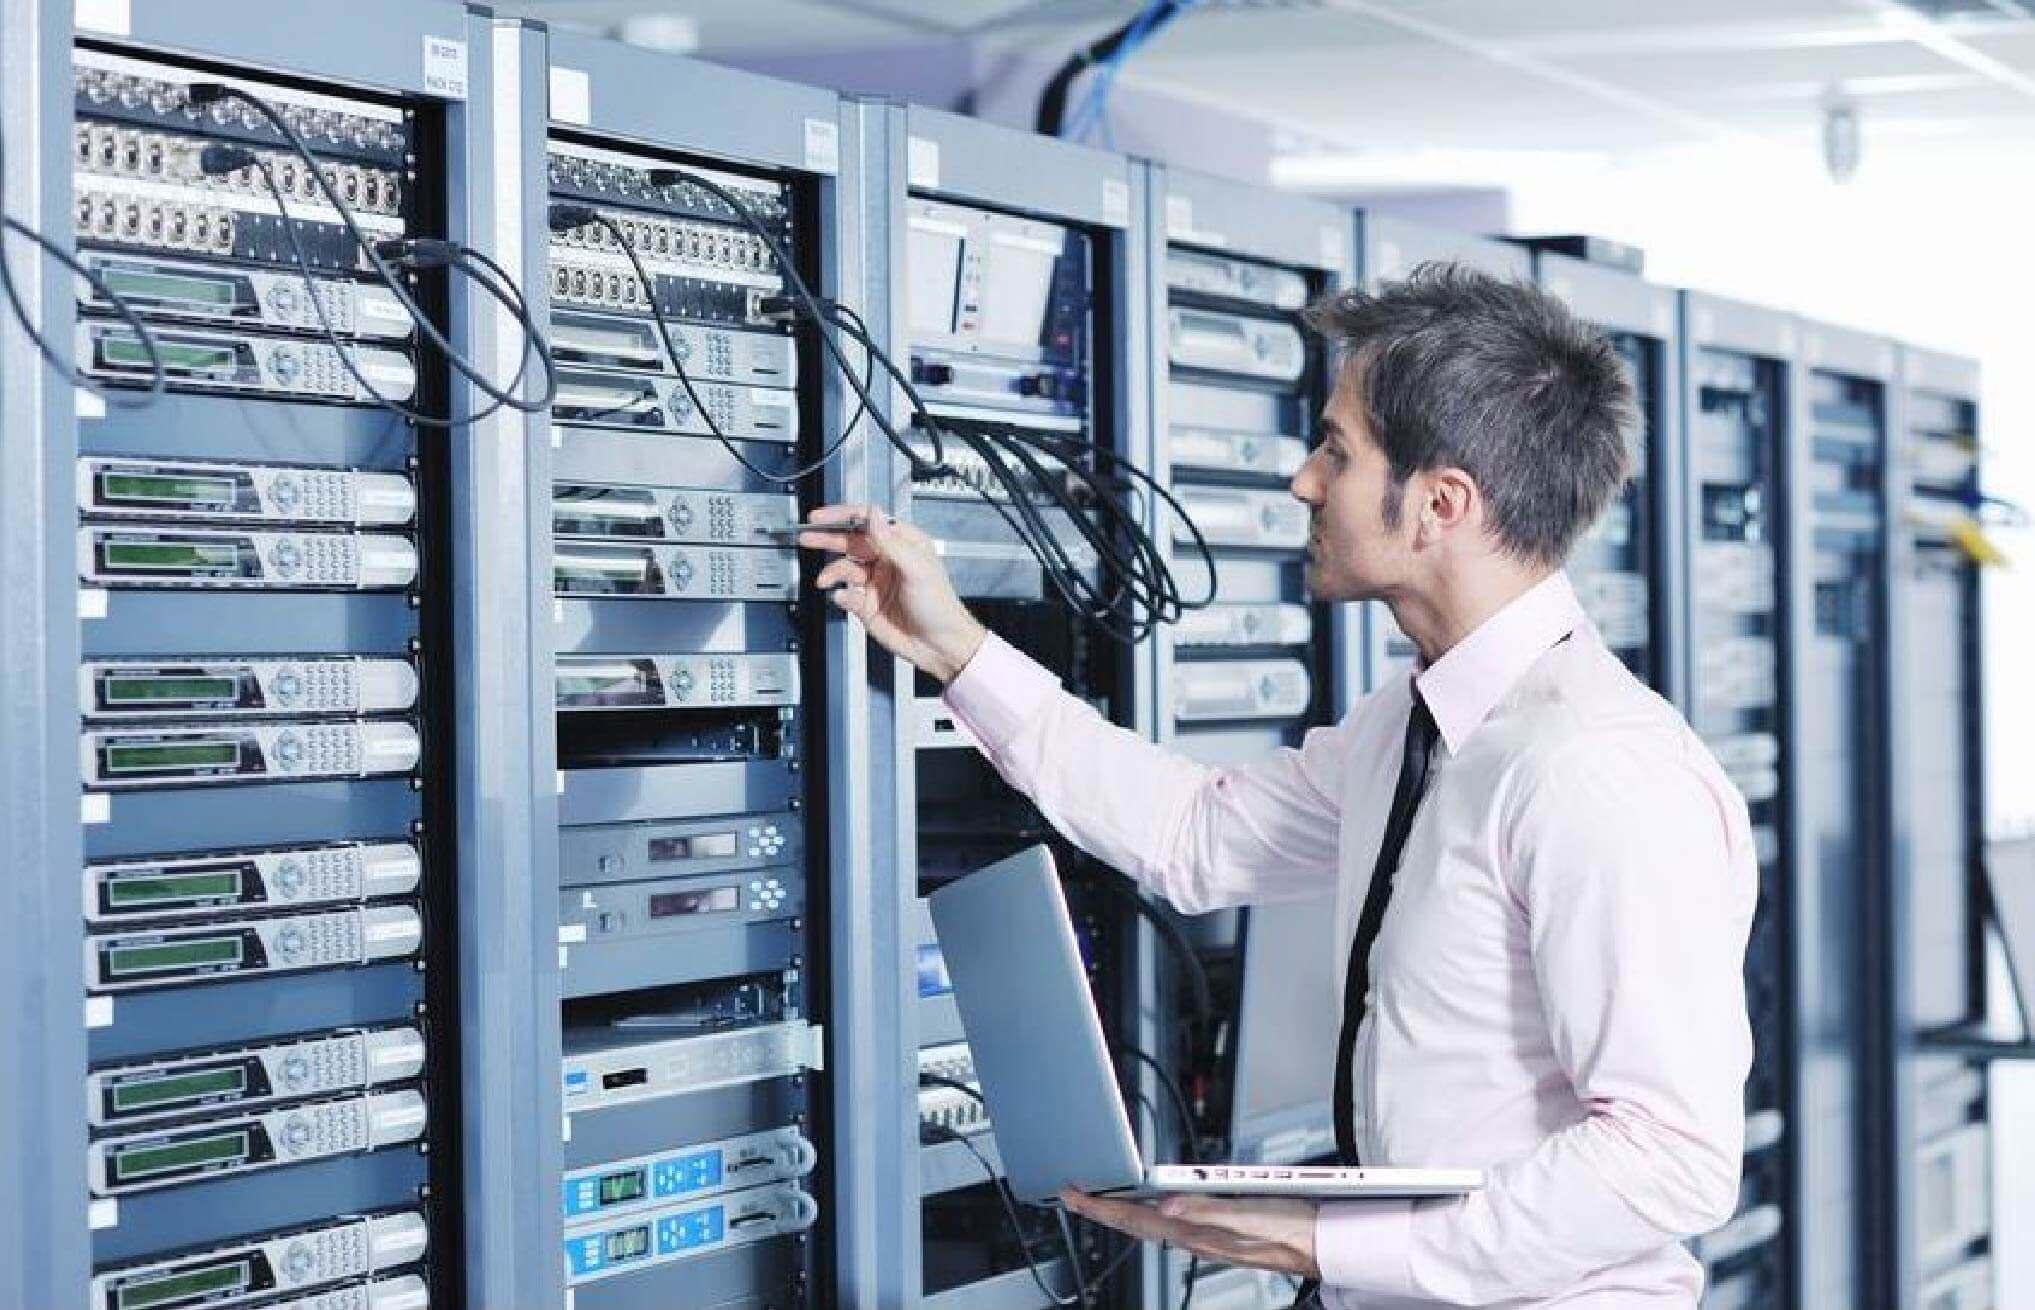 Asset tracking information technology image